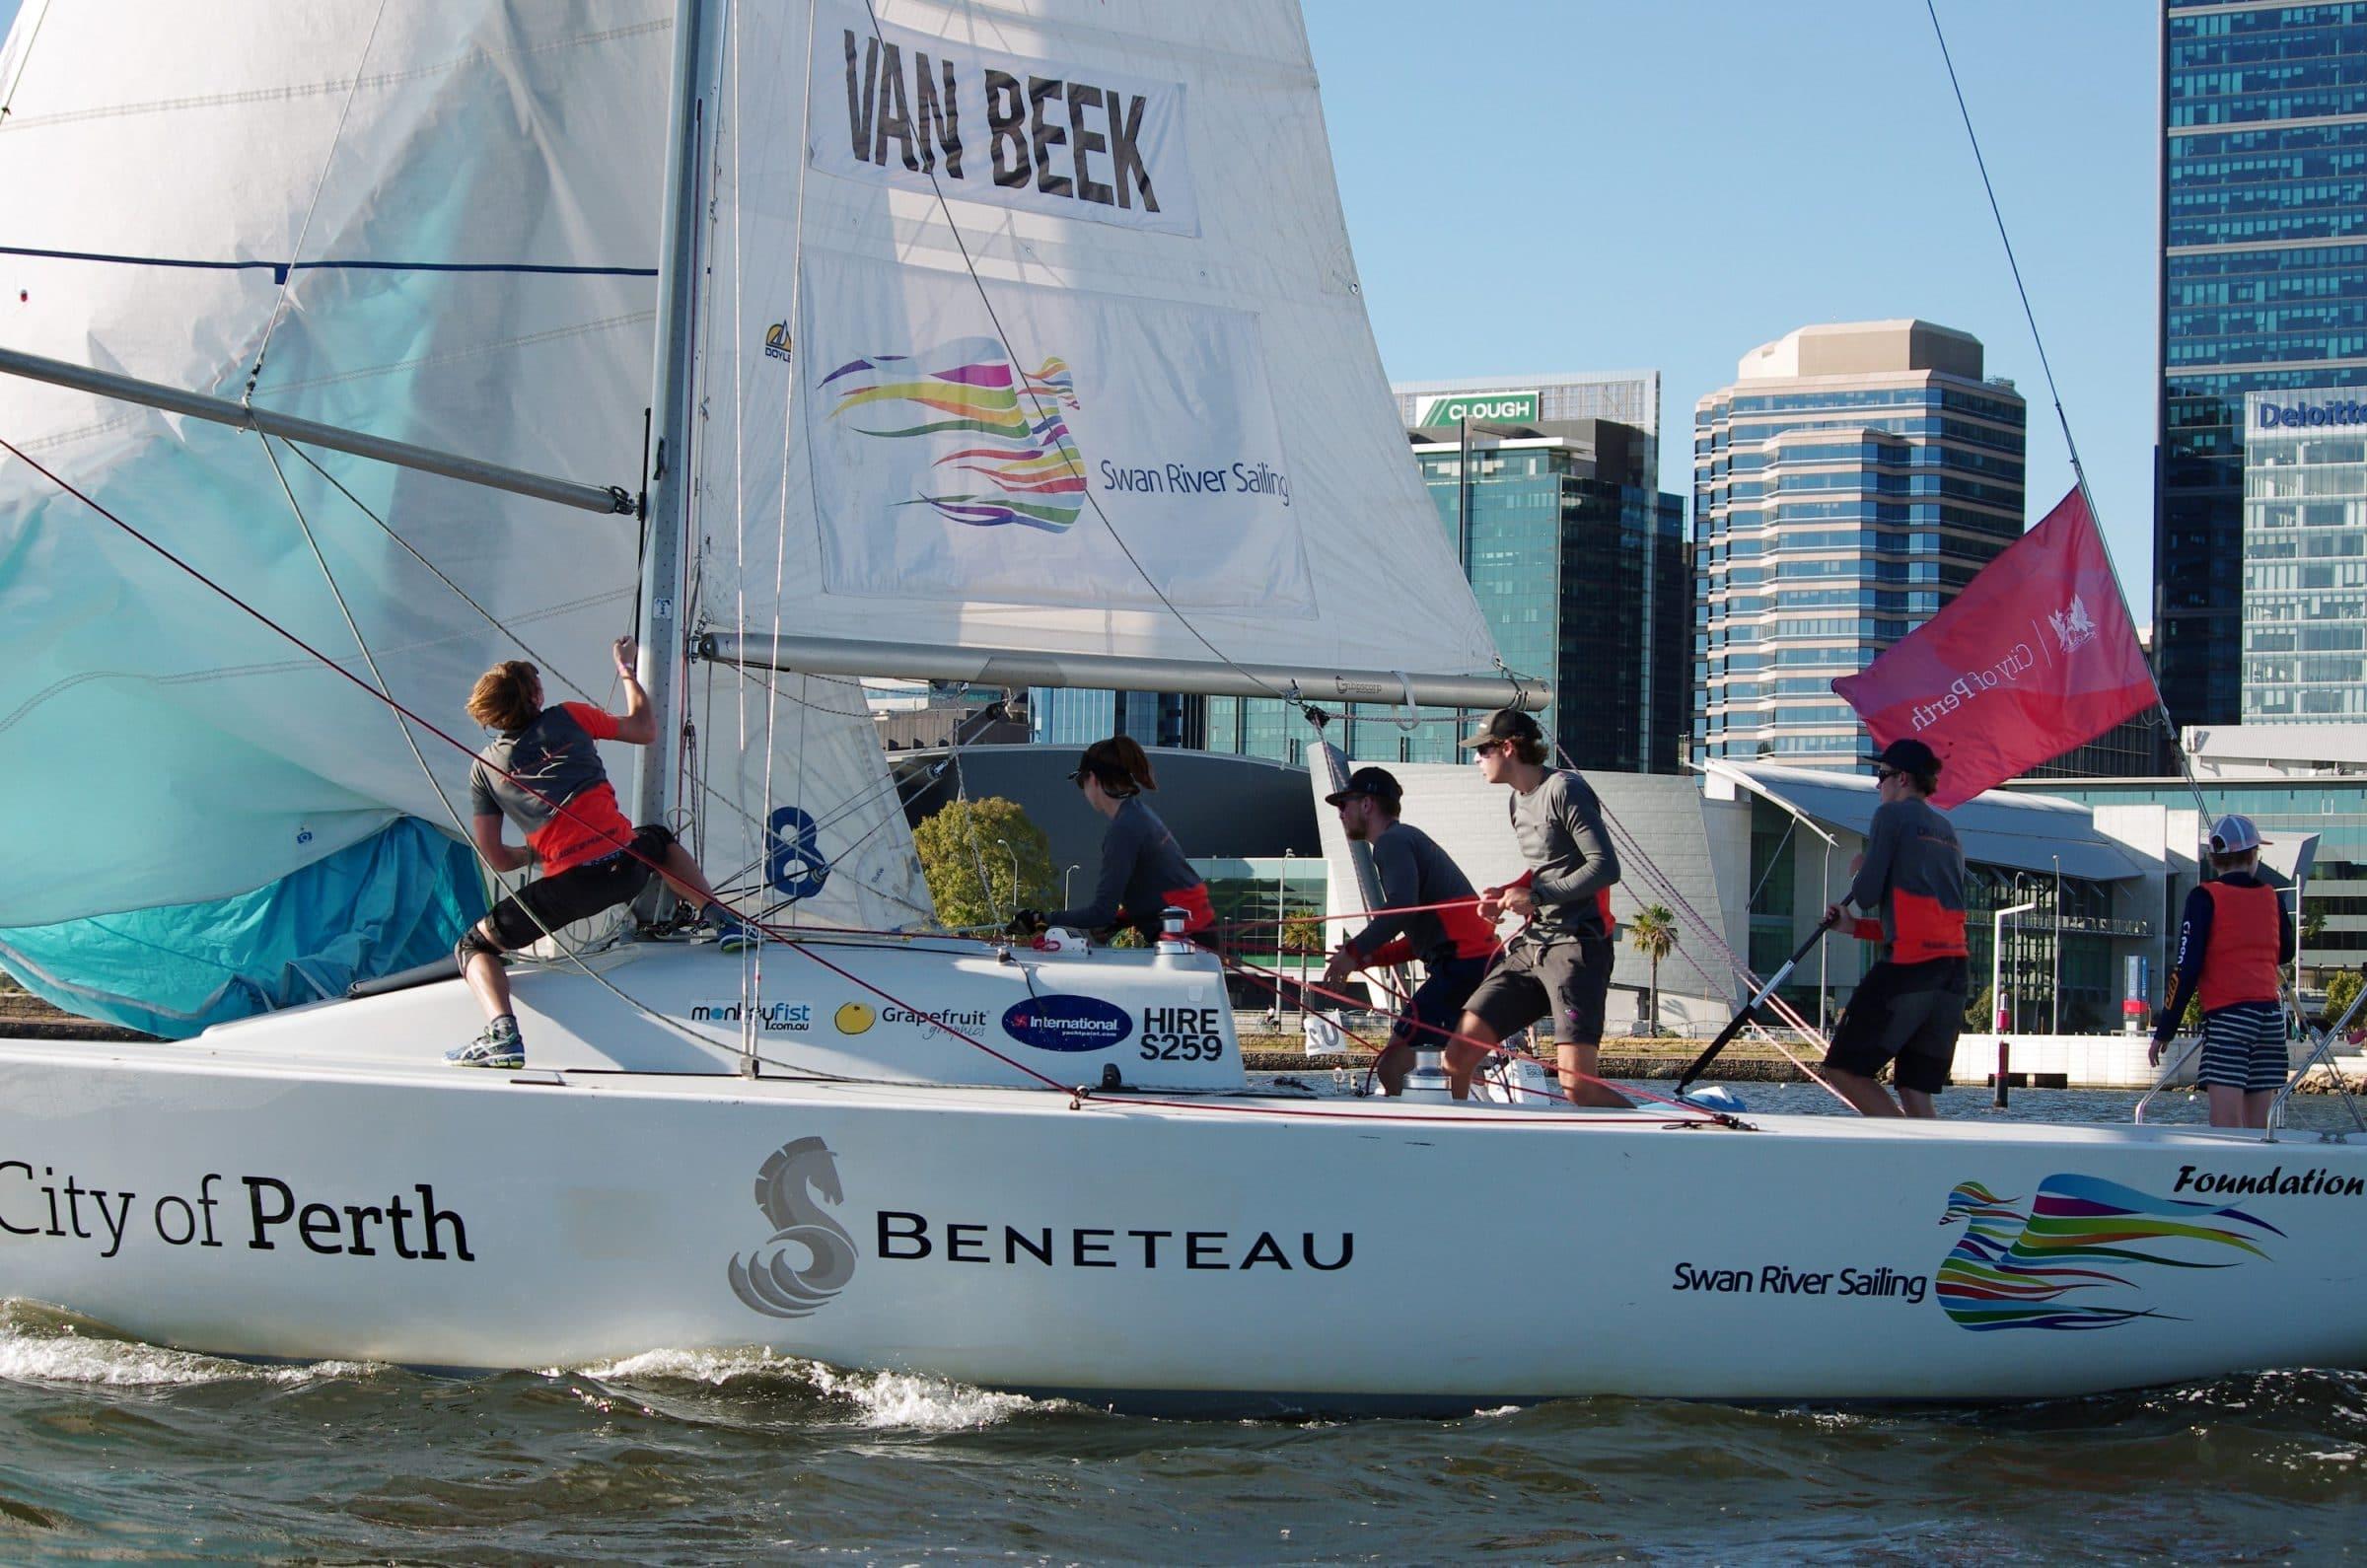 Jelmer Van Beek at the 2018 Warren Jones Regatta as part of the City of Perth Festival of Sail